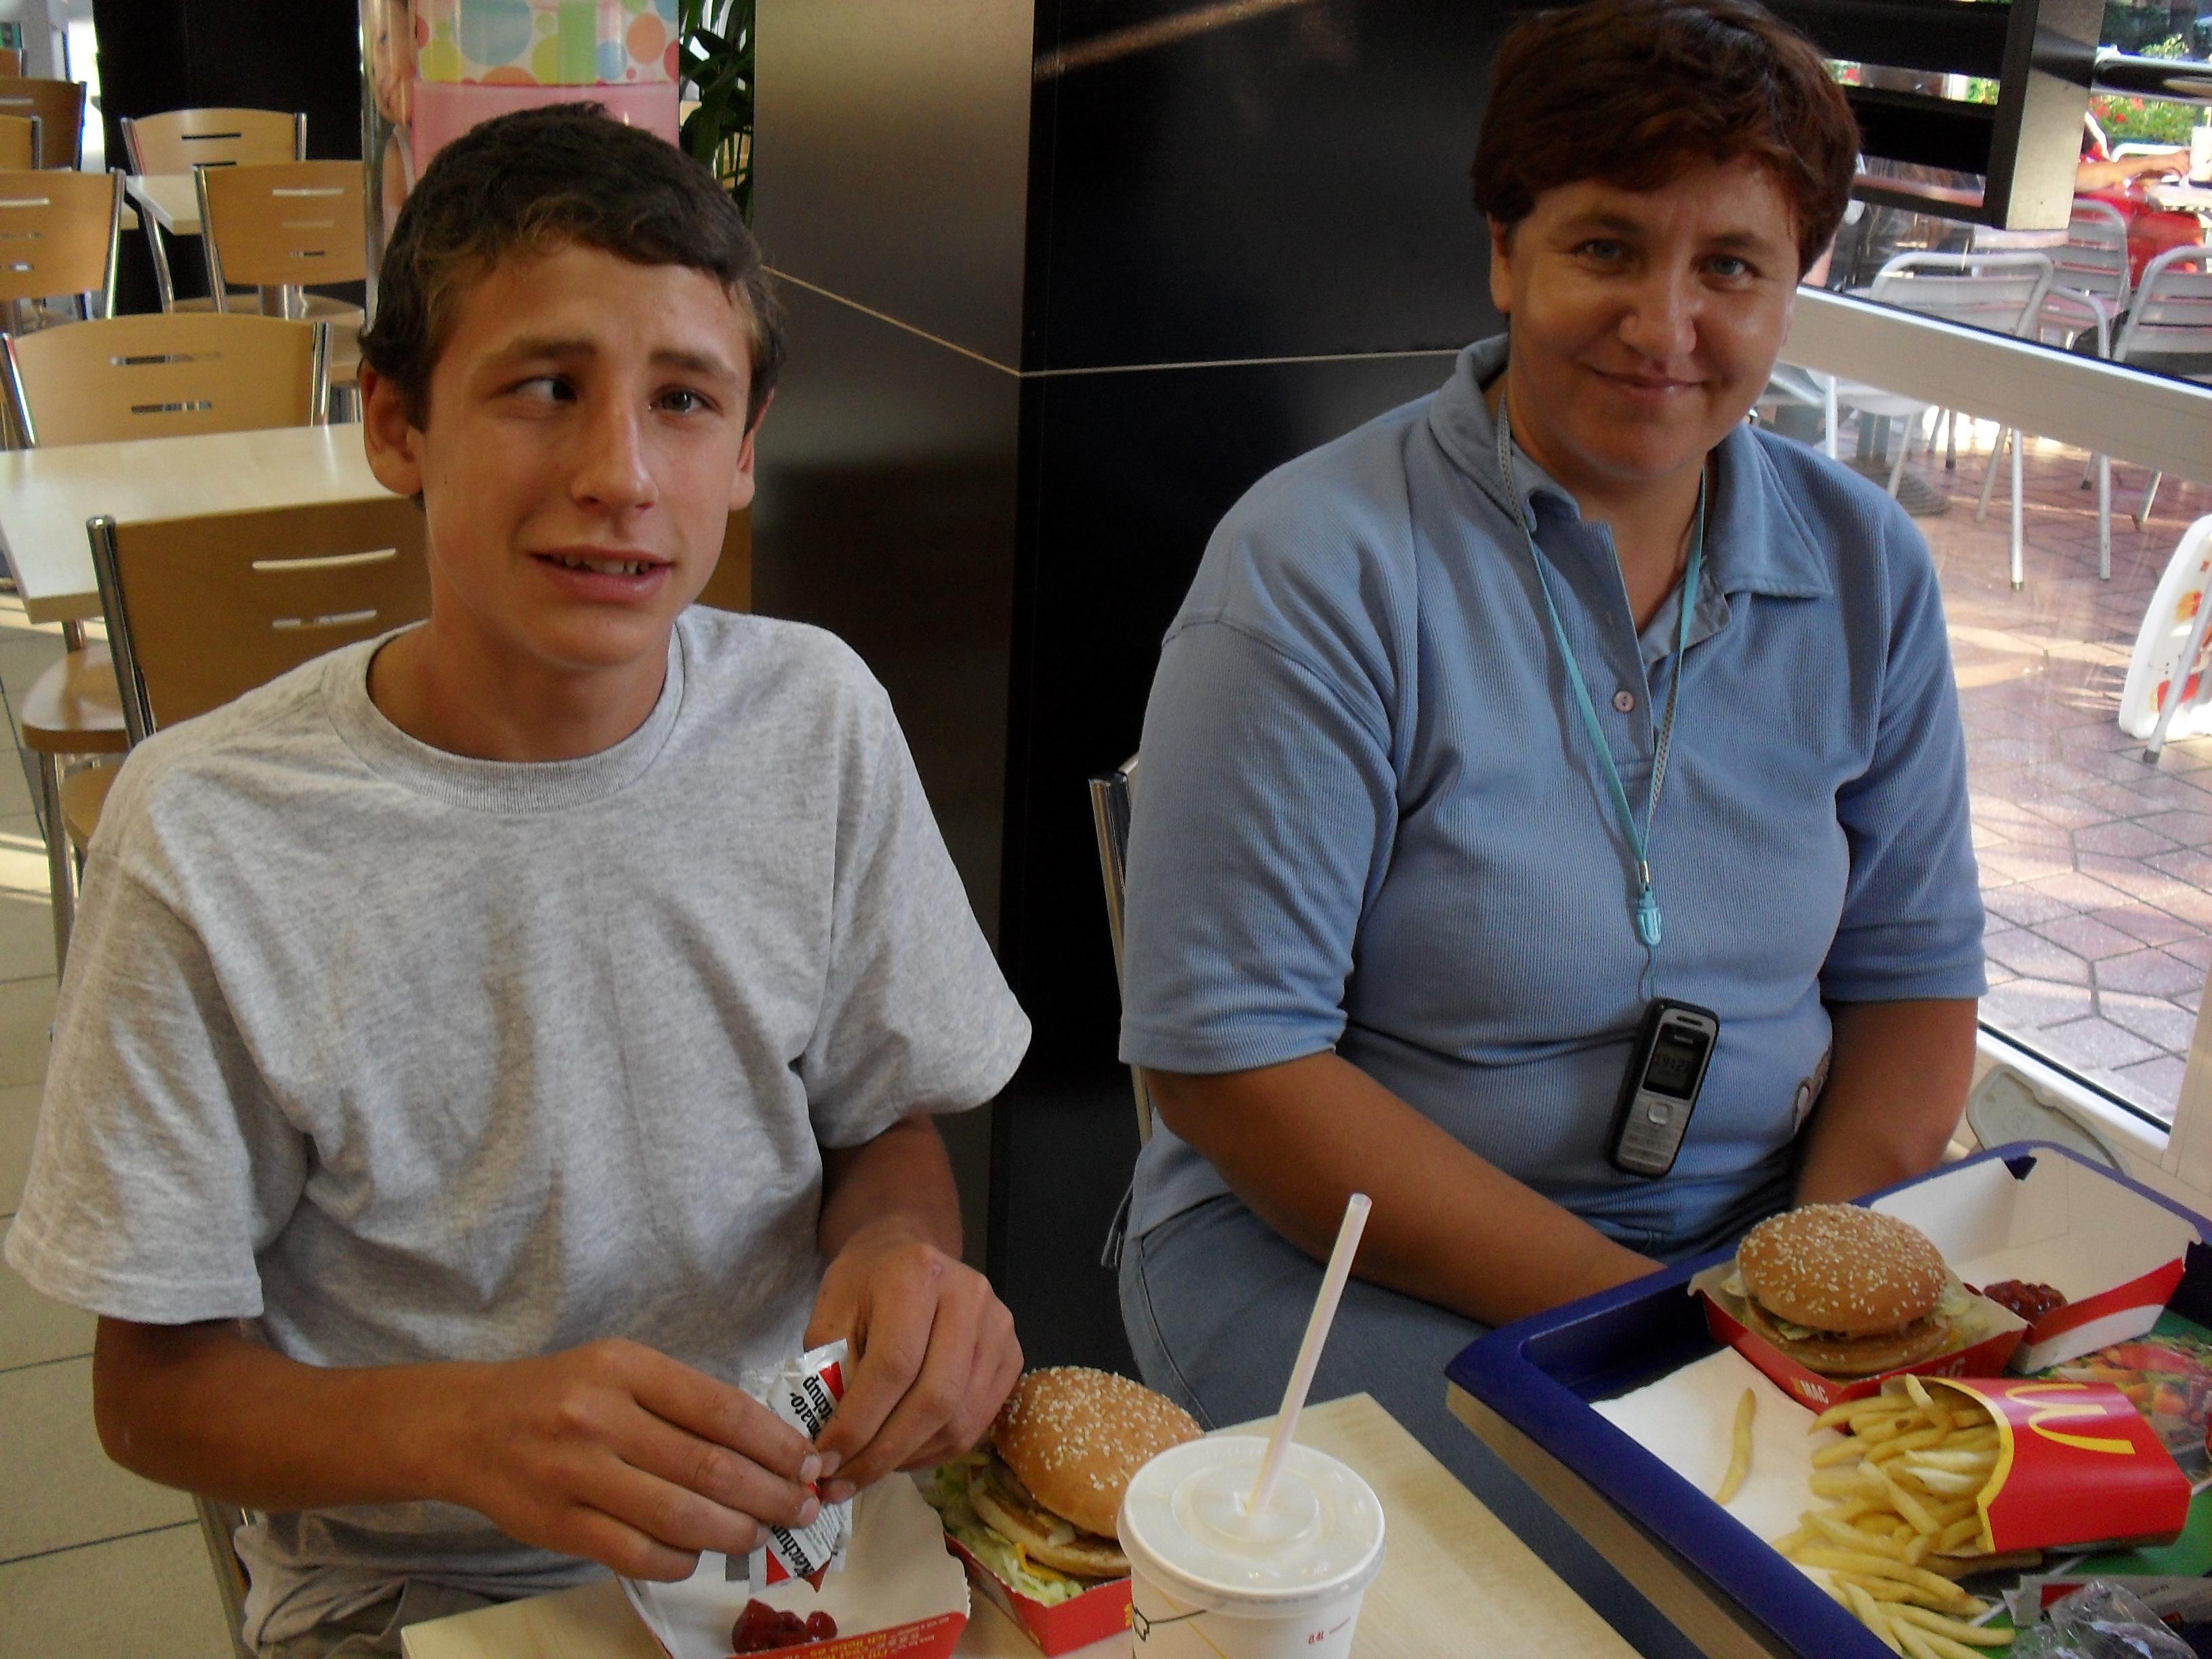 Enjoying a BigMac and fries!